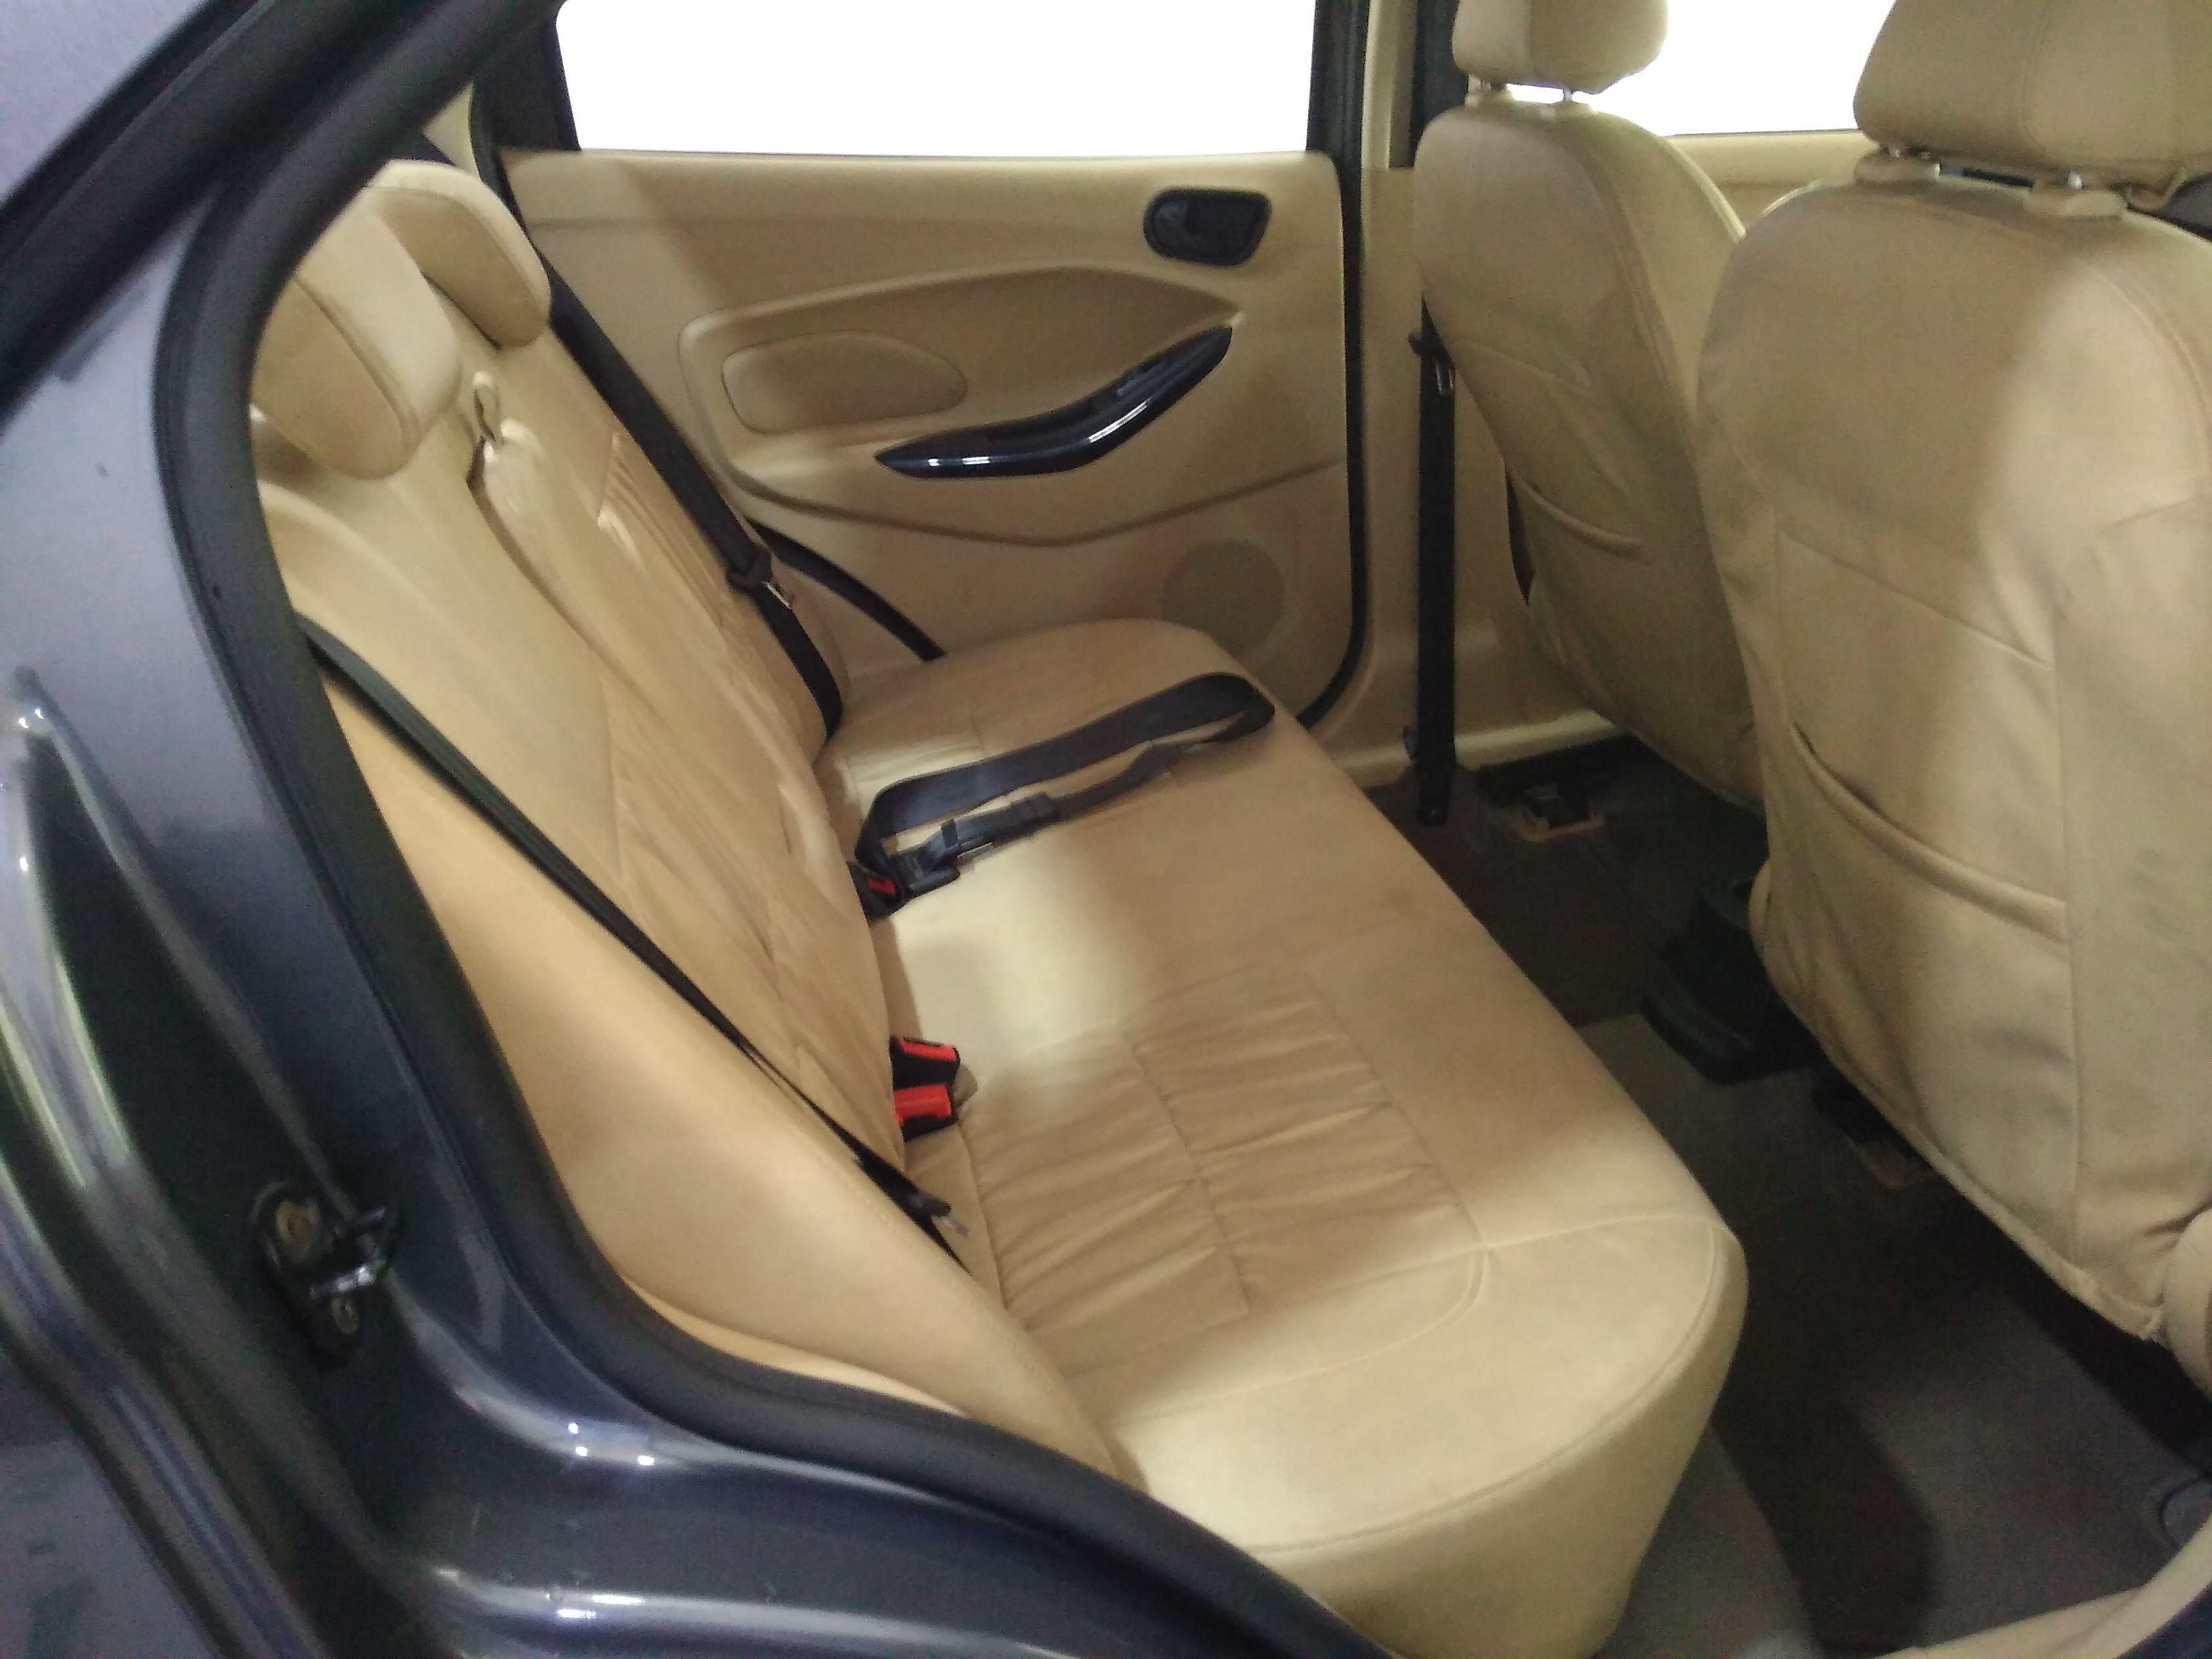 Ford Figo Aspire Titanium 1 5 Mahindra First Choice